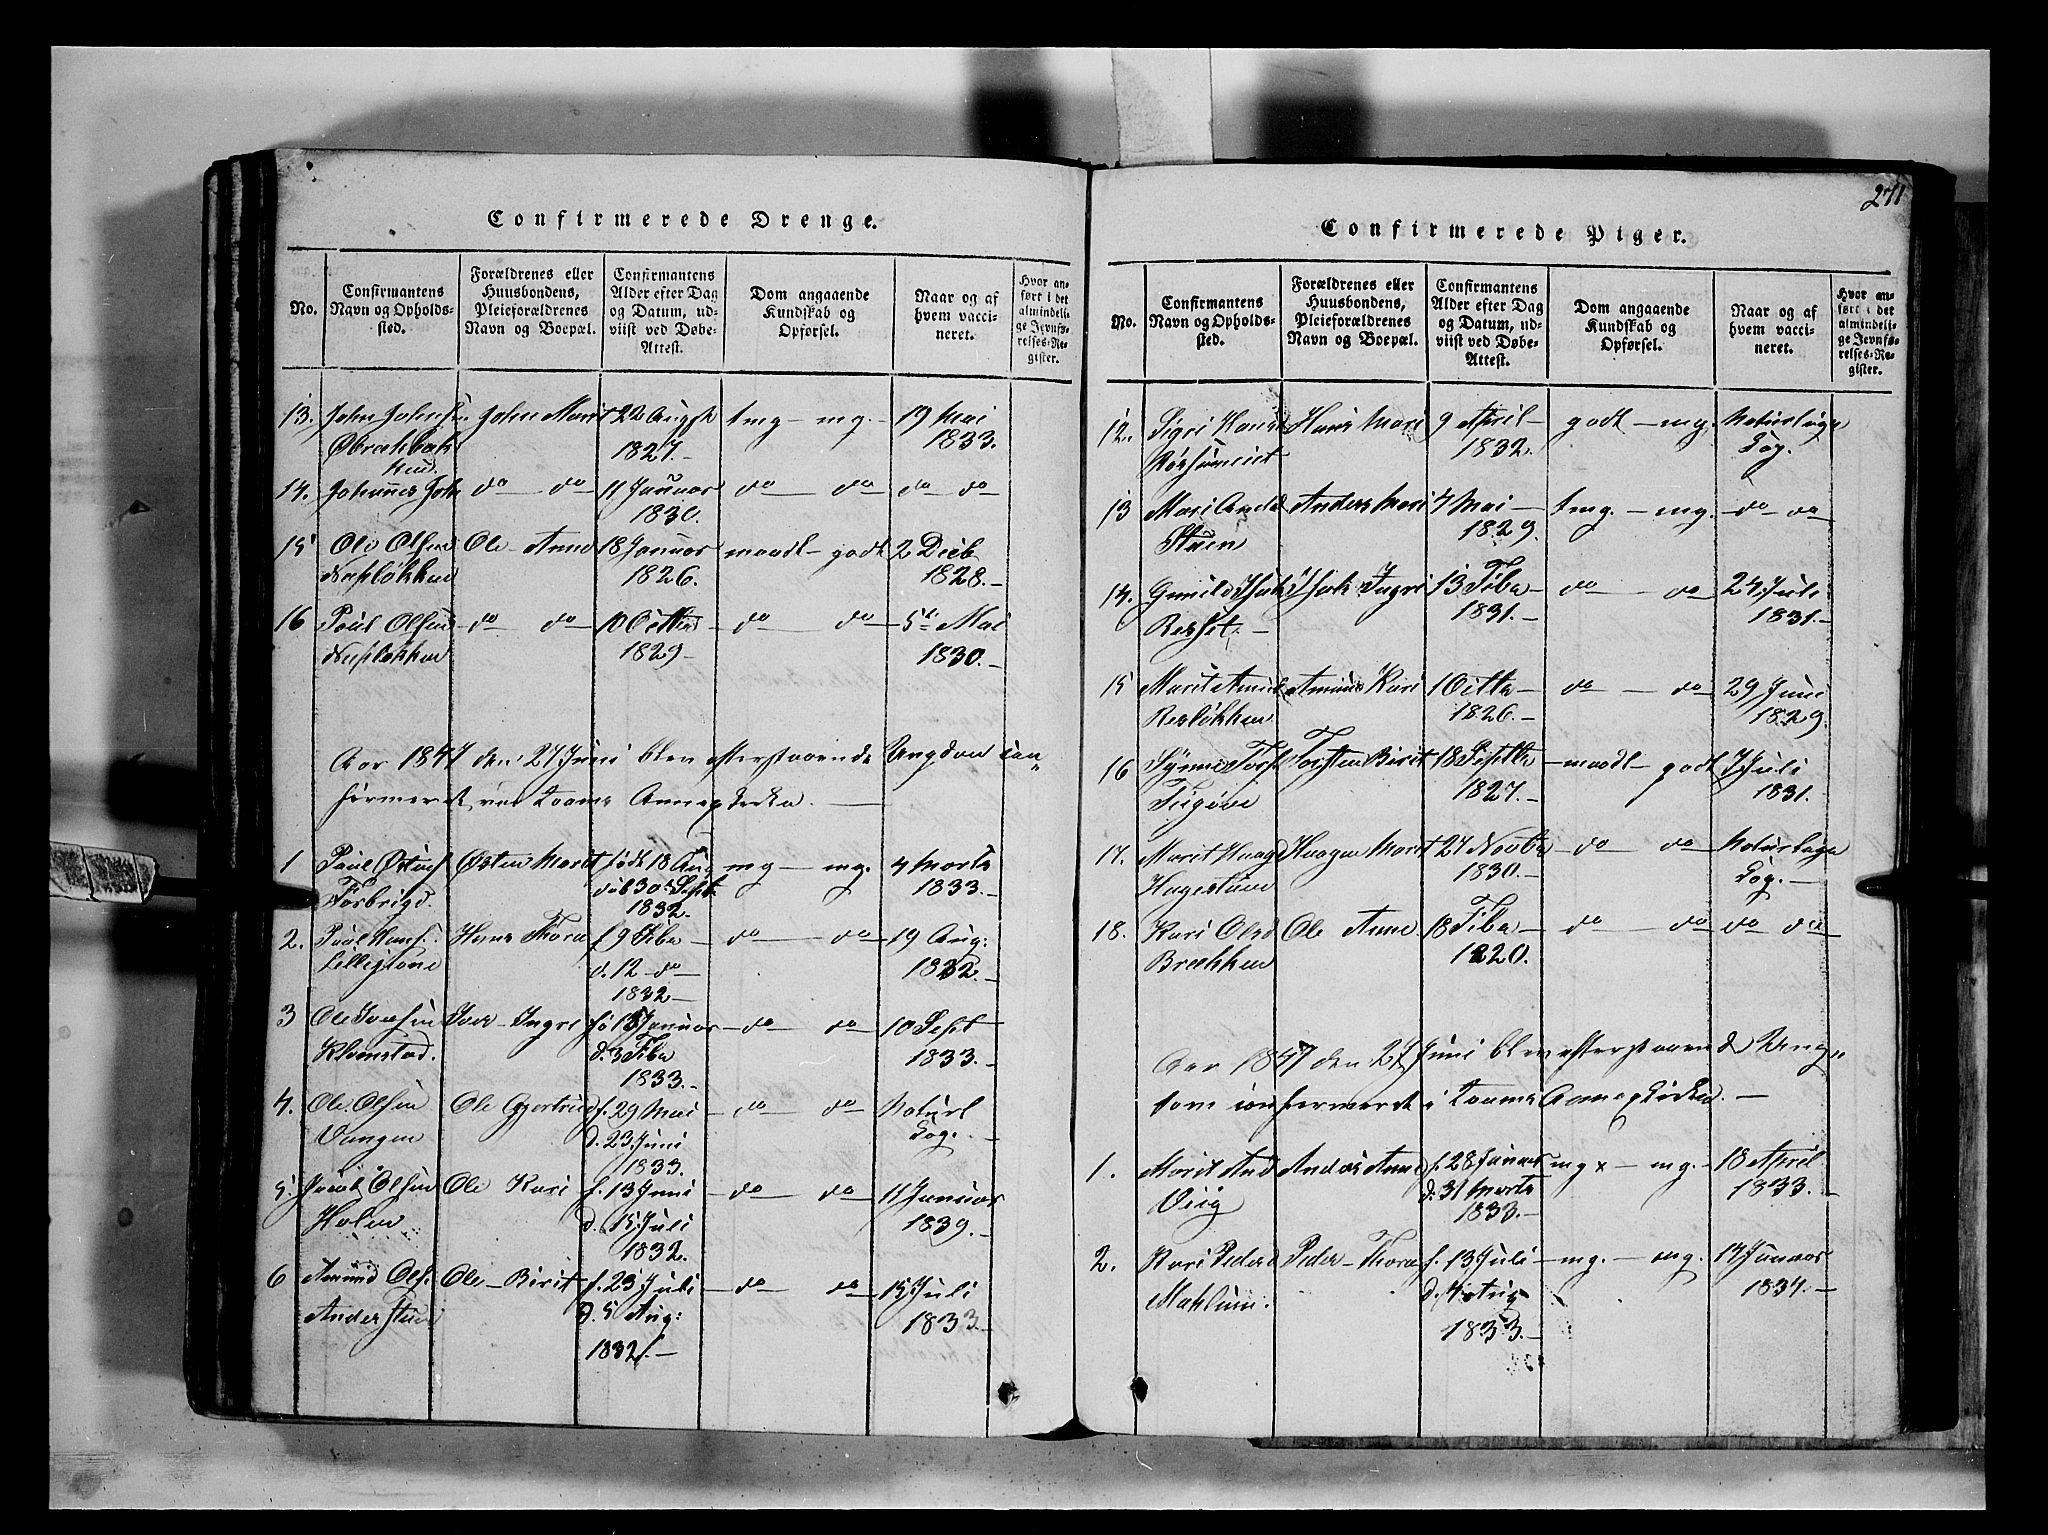 SAH, Fron prestekontor, H/Ha/Hab/L0002: Klokkerbok nr. 2, 1816-1850, s. 271